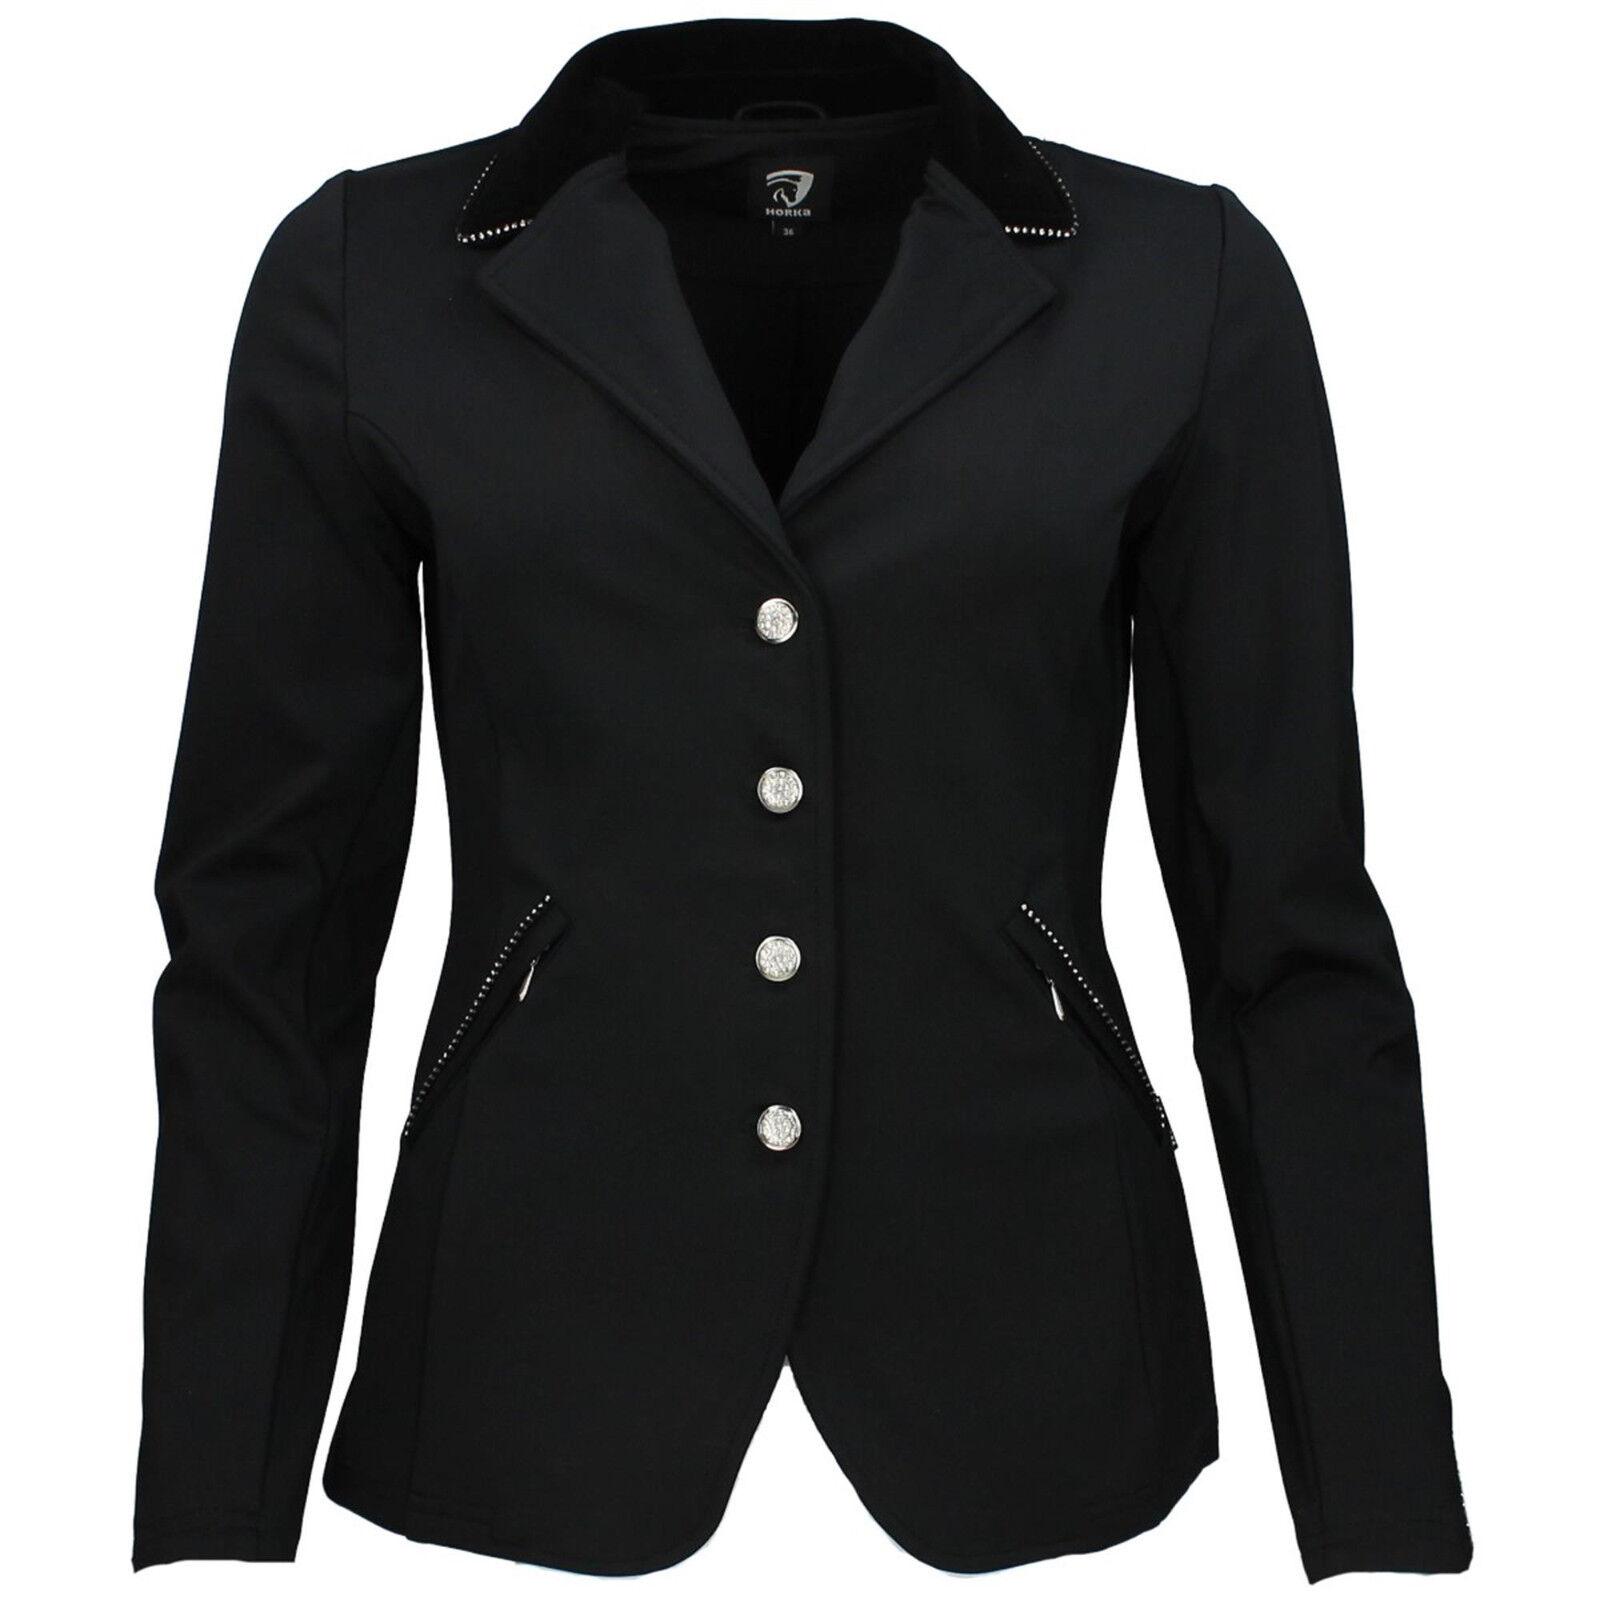 Horka señora reitsakko, Softshell, negro, pedrería, talla talla talla 38, Victory 886b8a